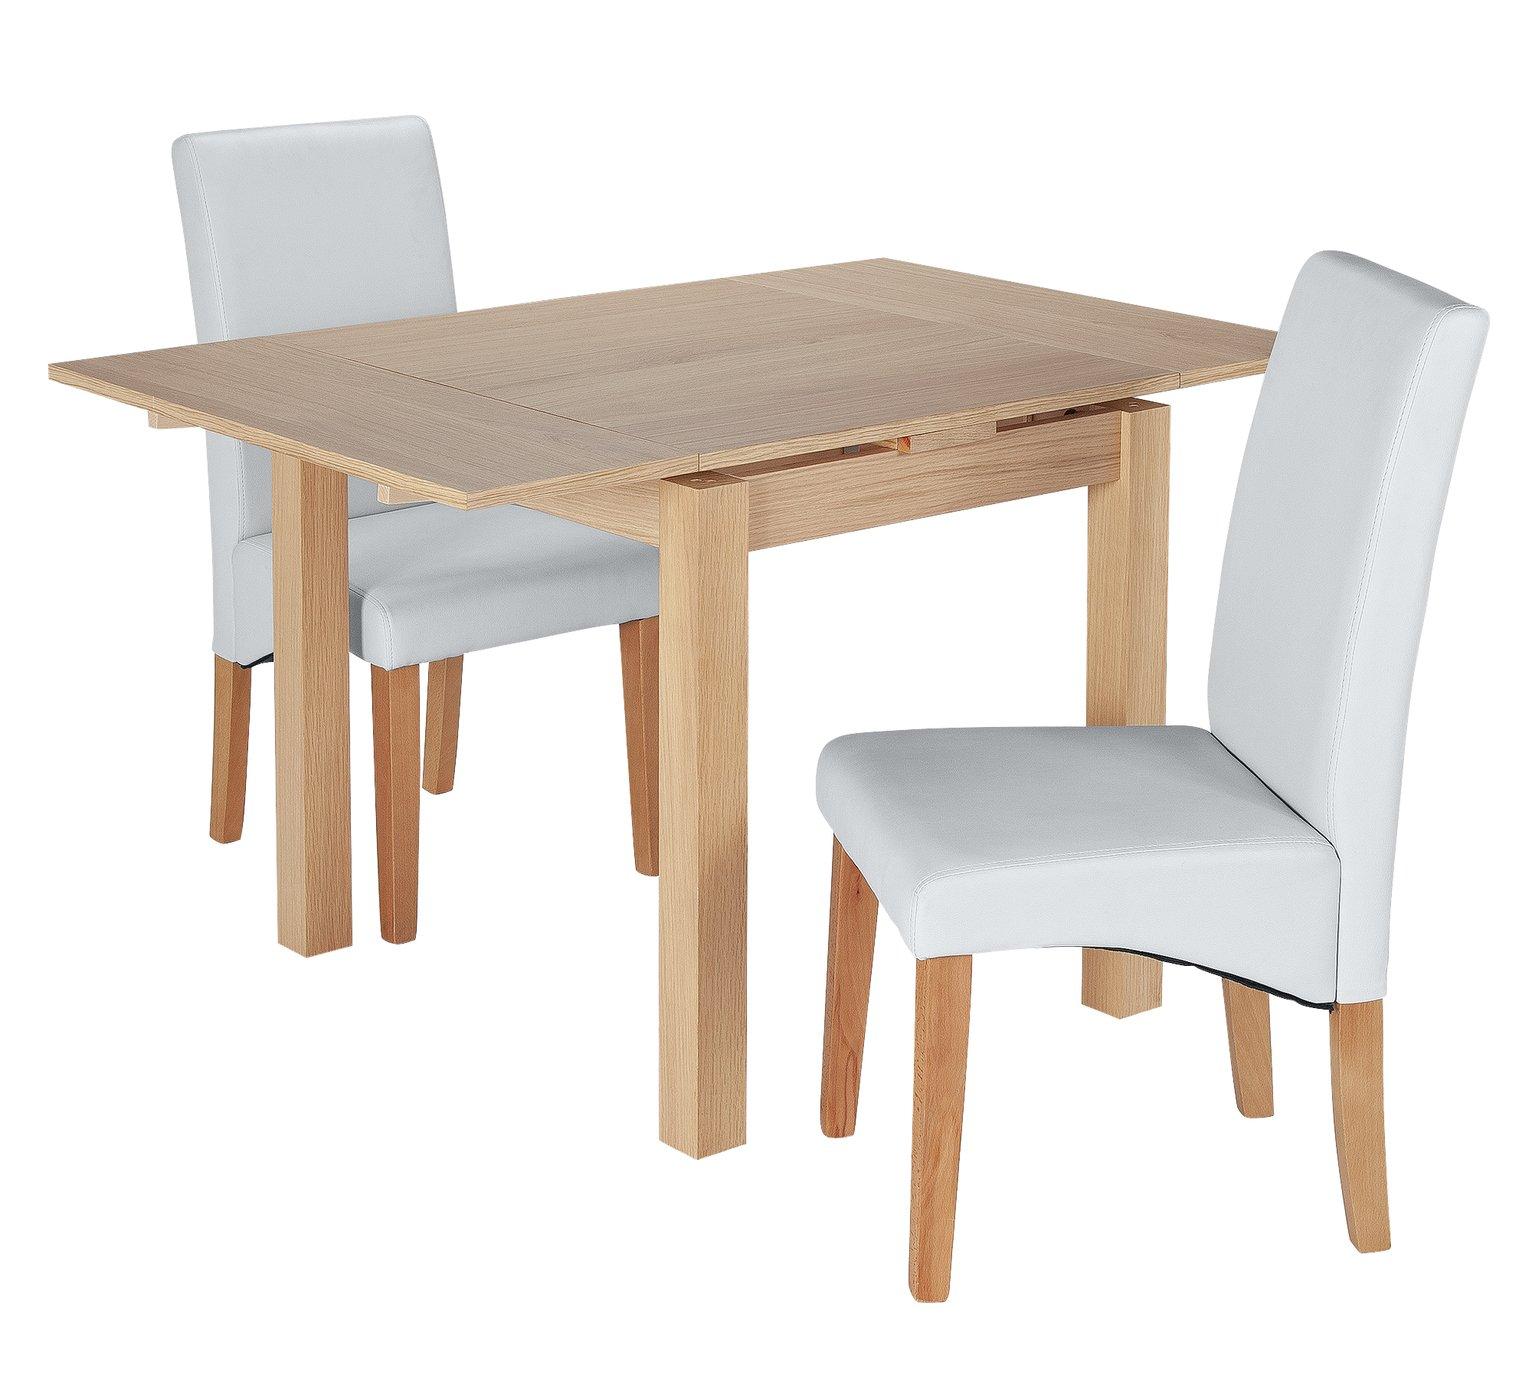 Argos Home Clifton Oak Extending Table & 2 Grey Chairs